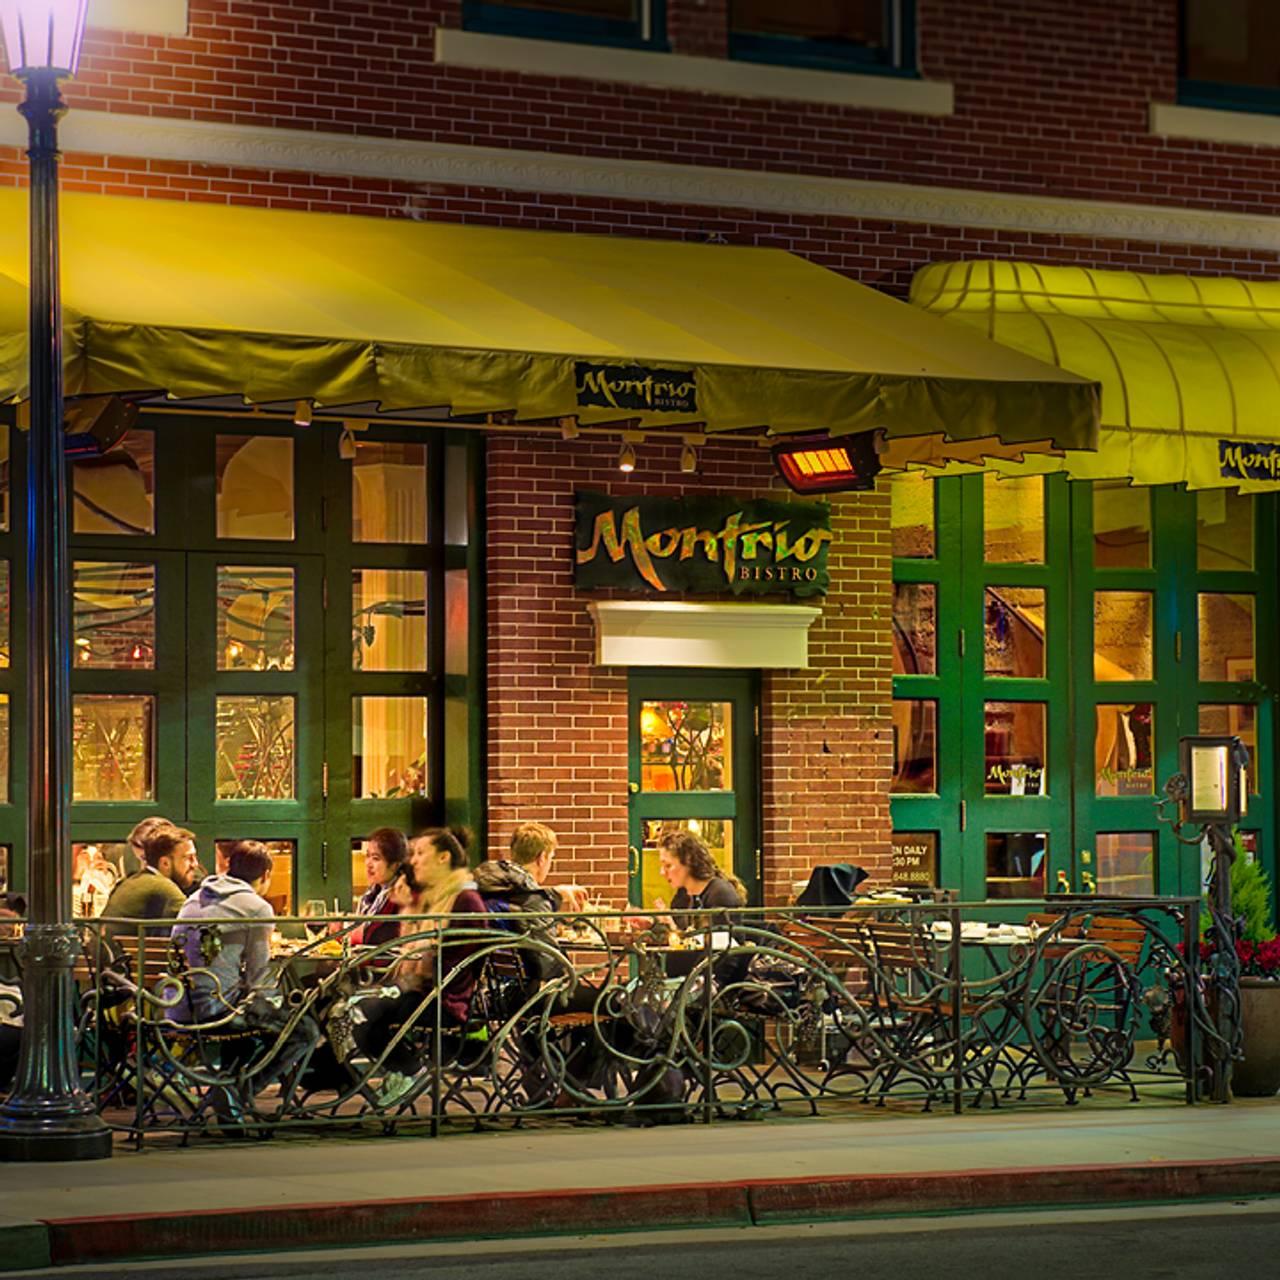 Montrio Bistro Restaurant - Monterey, CA | OpenTable